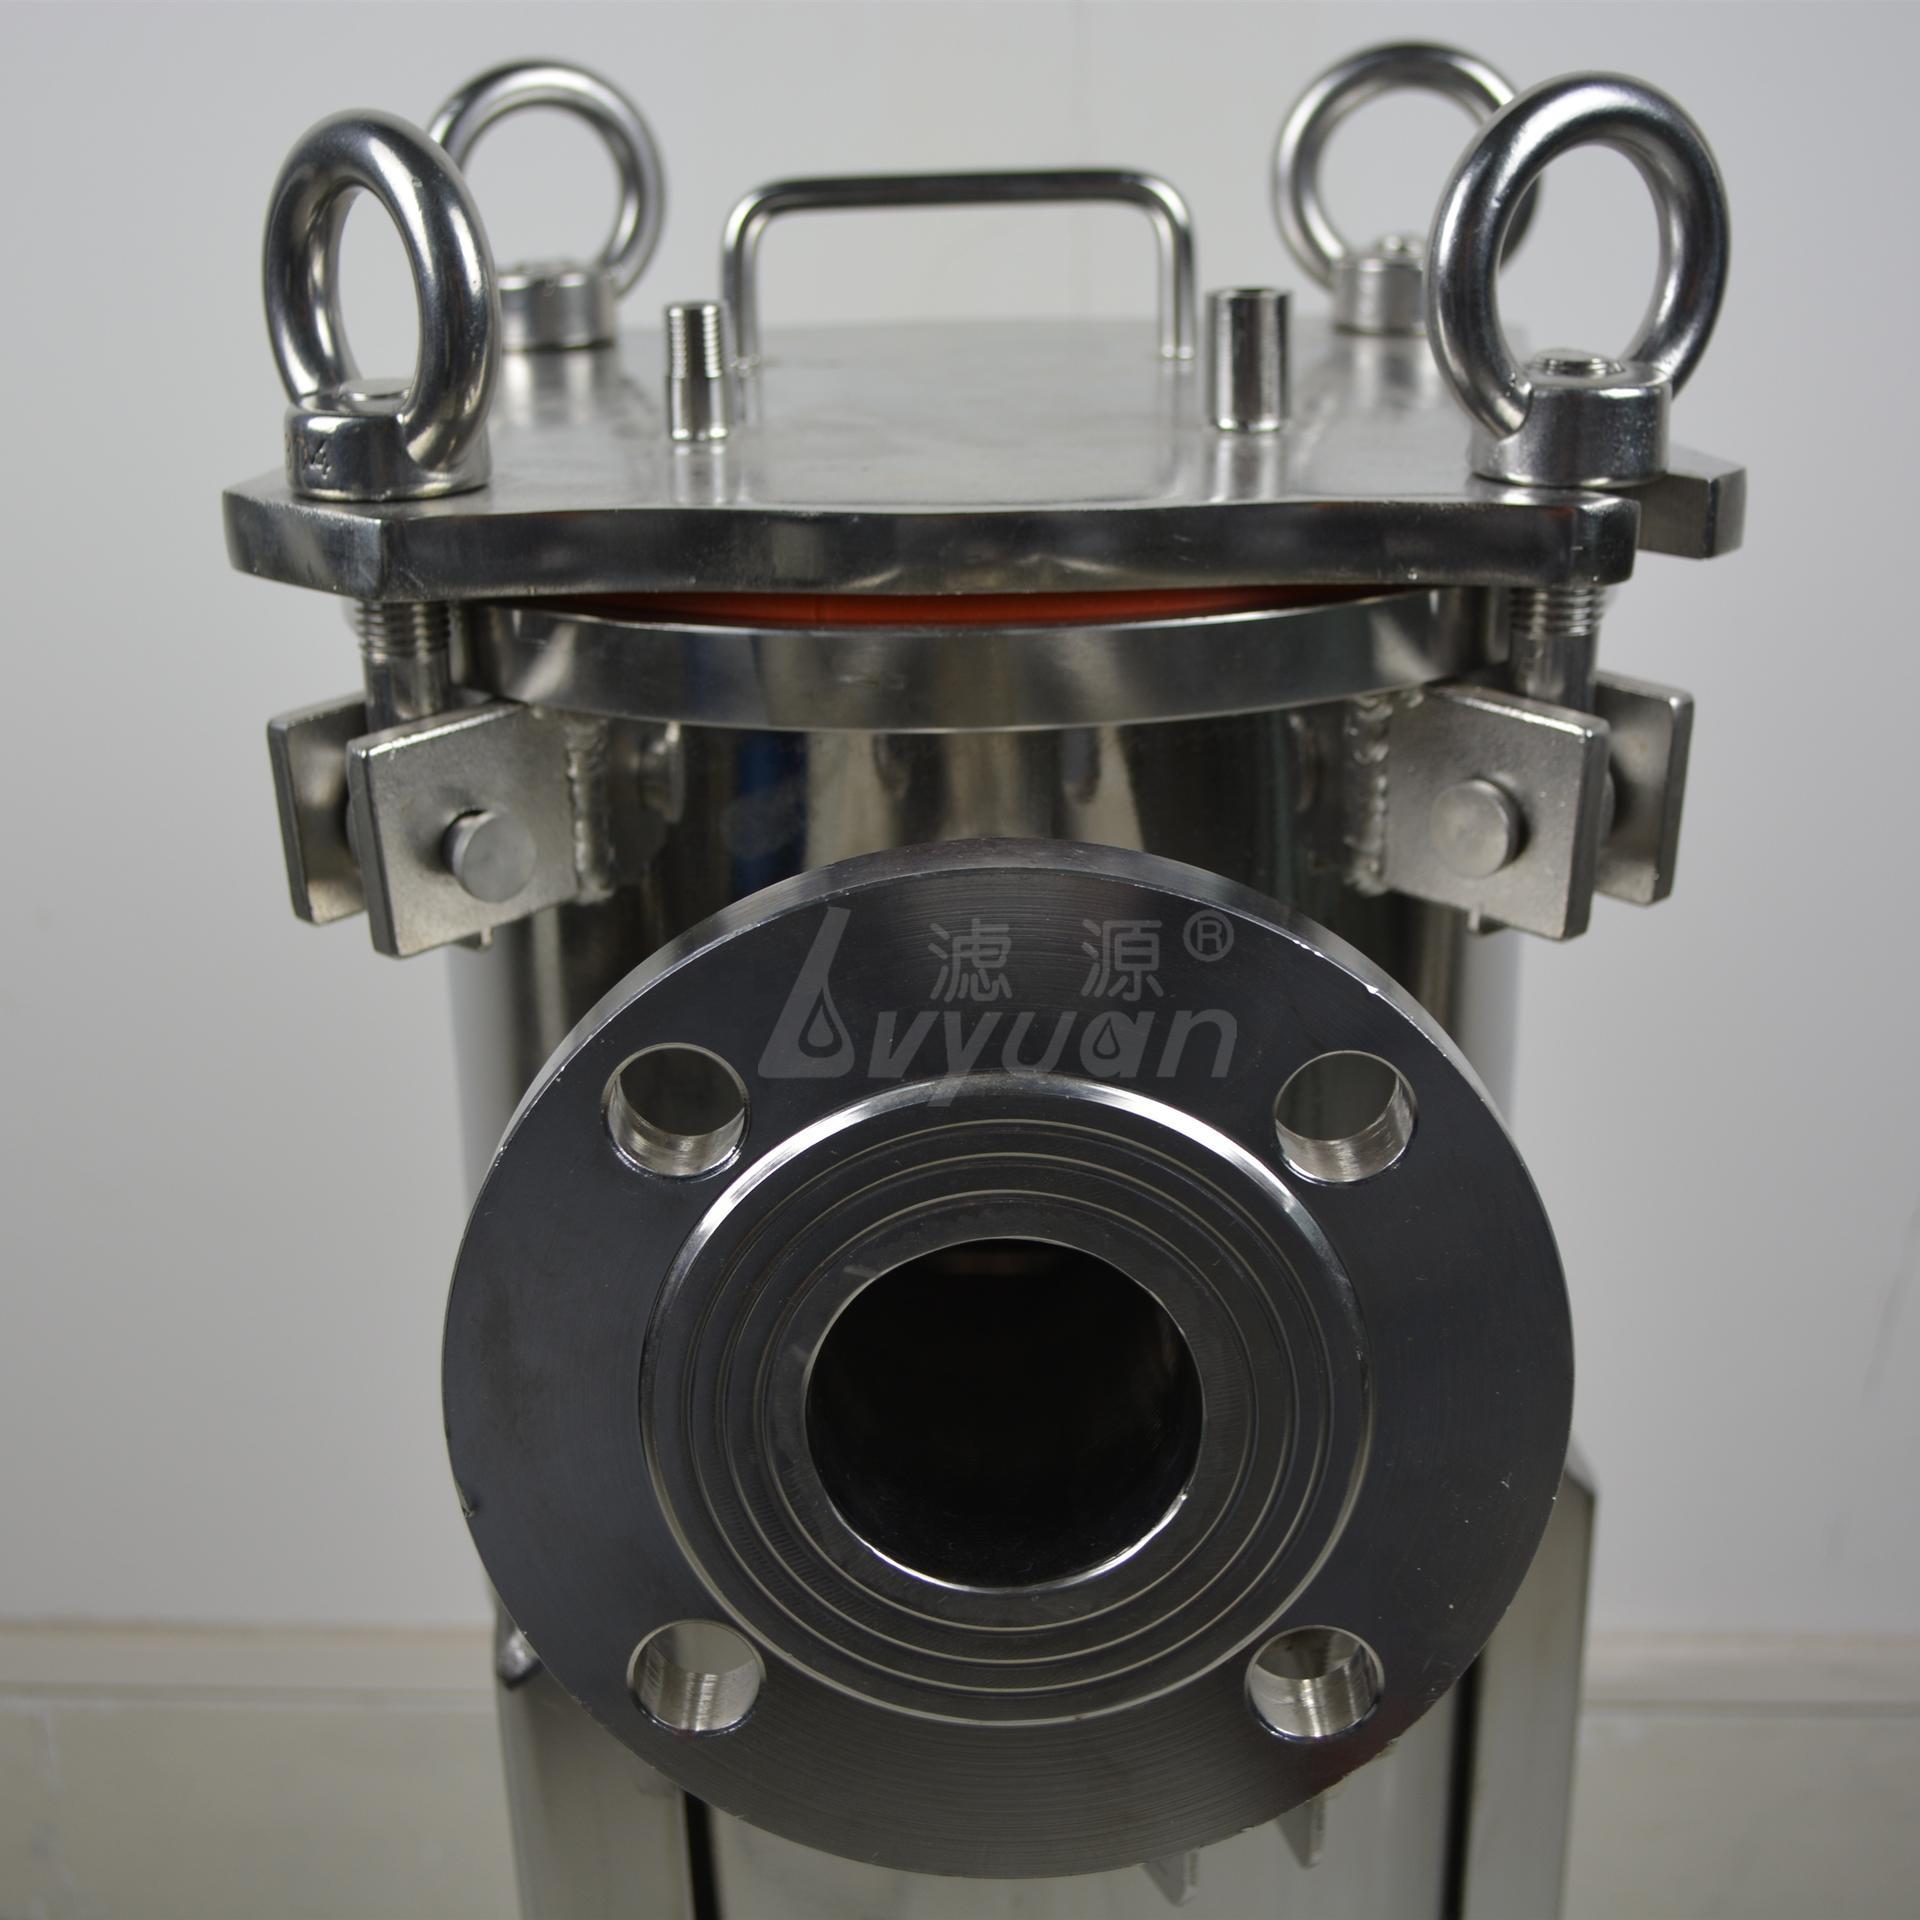 High pressure water filter housing/ Single bag filter housing Stainless steel ss304 ss316 with filter bag 1 5 micron